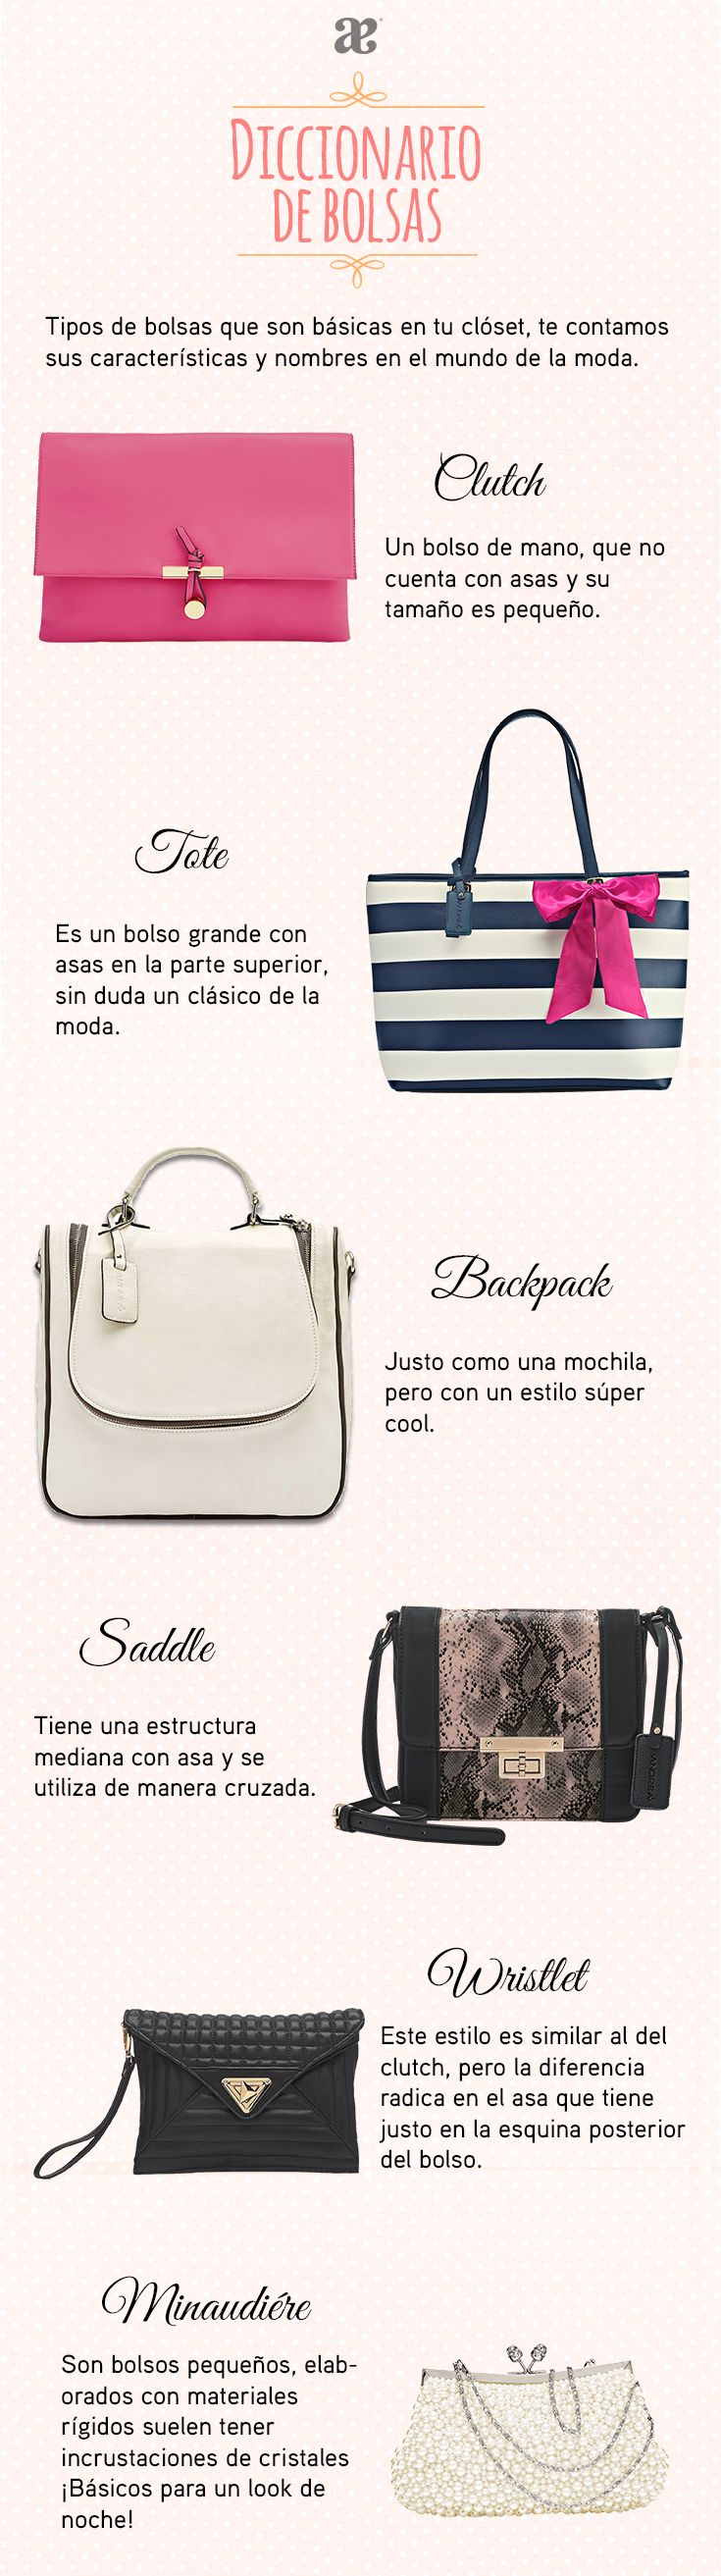 ¿Ya descubriste el nombre de tu #bolsa favorita? #Moda #Fashion #OOTD #Bags